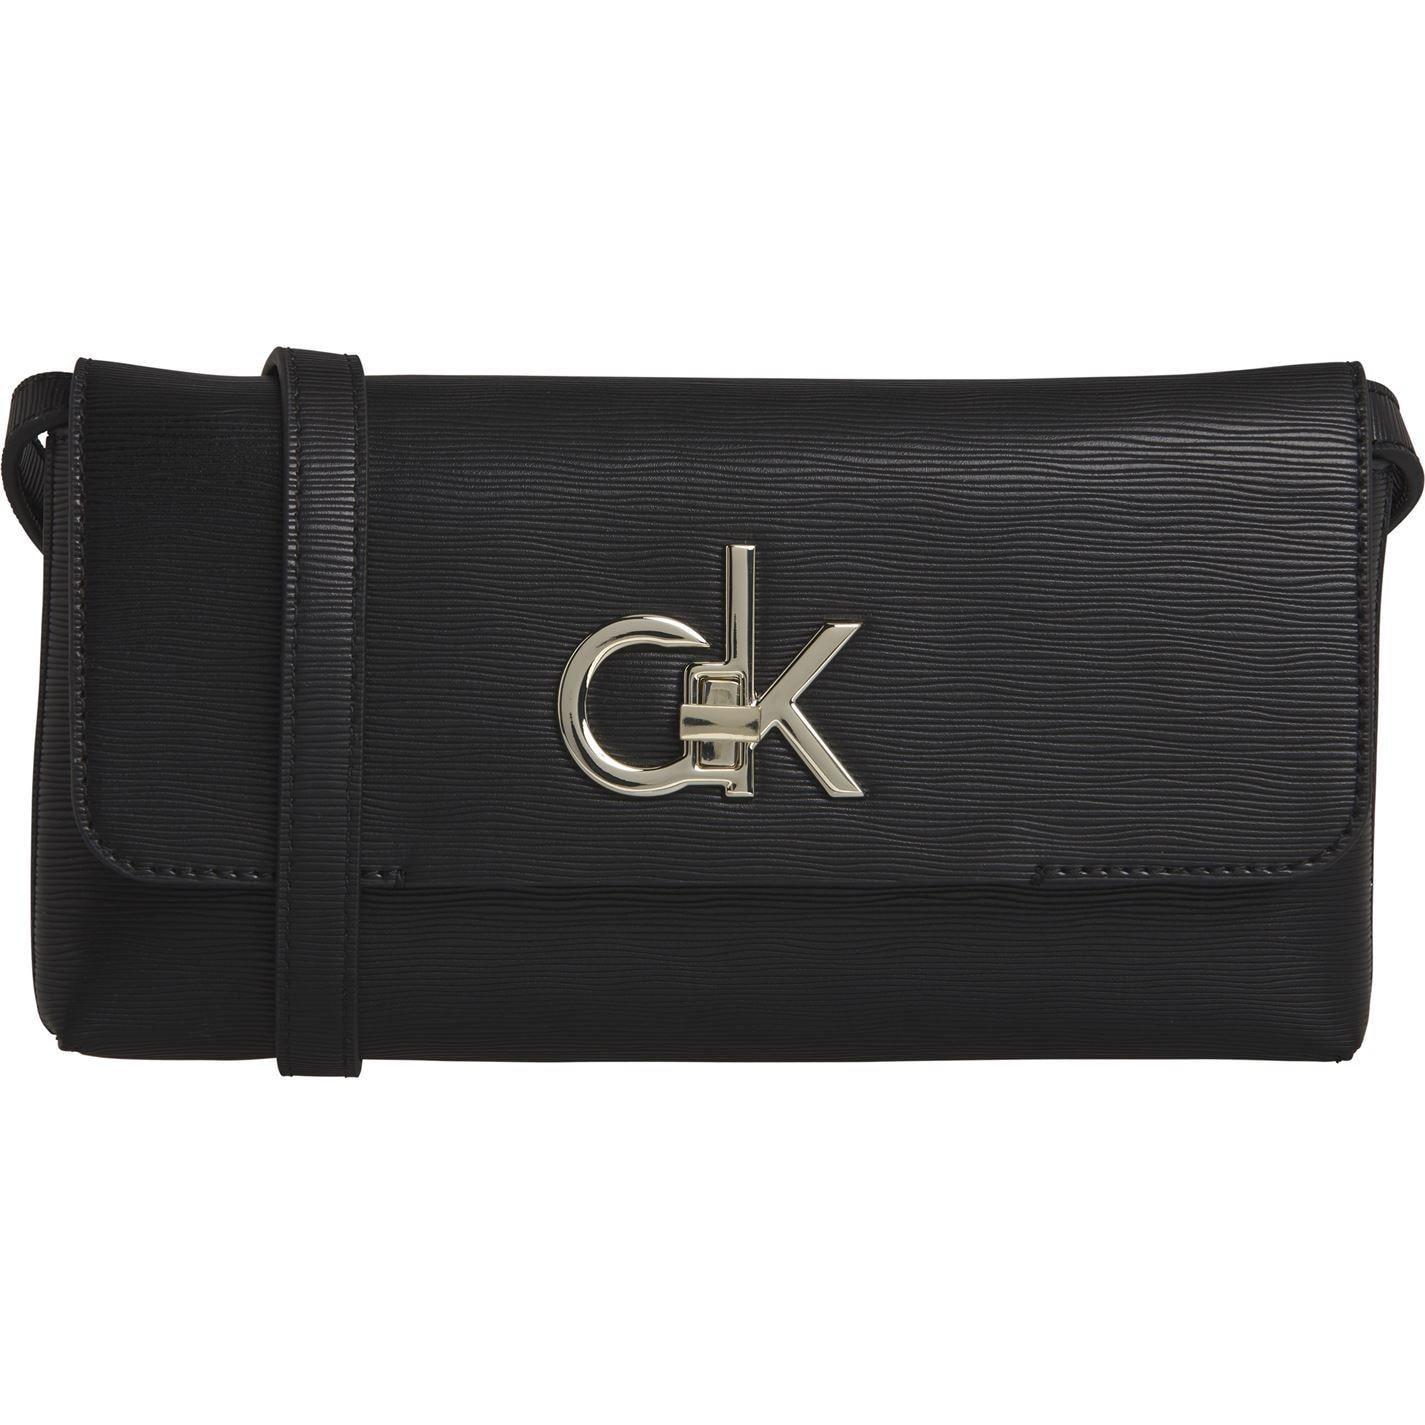 Calvin Klein Lock Clutch Bag